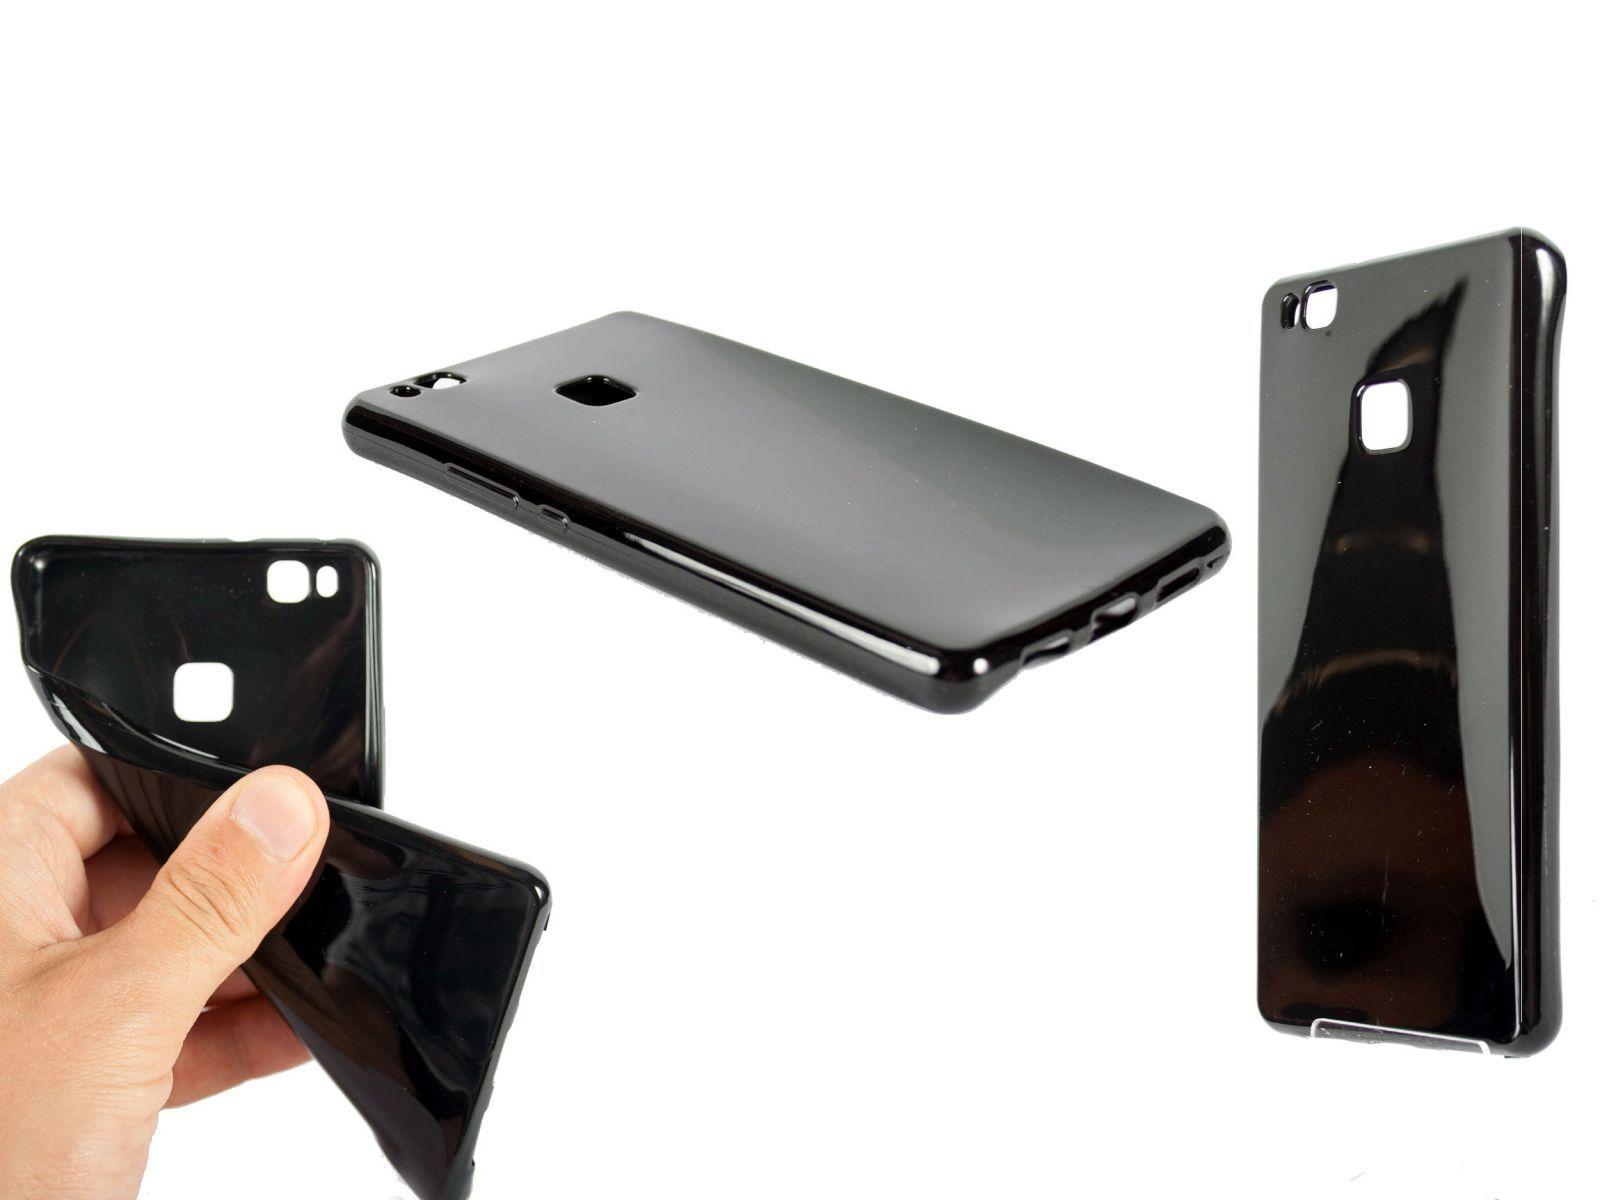 Pouzdro na Lenovo P1m - Jelly case - černé GreenGo